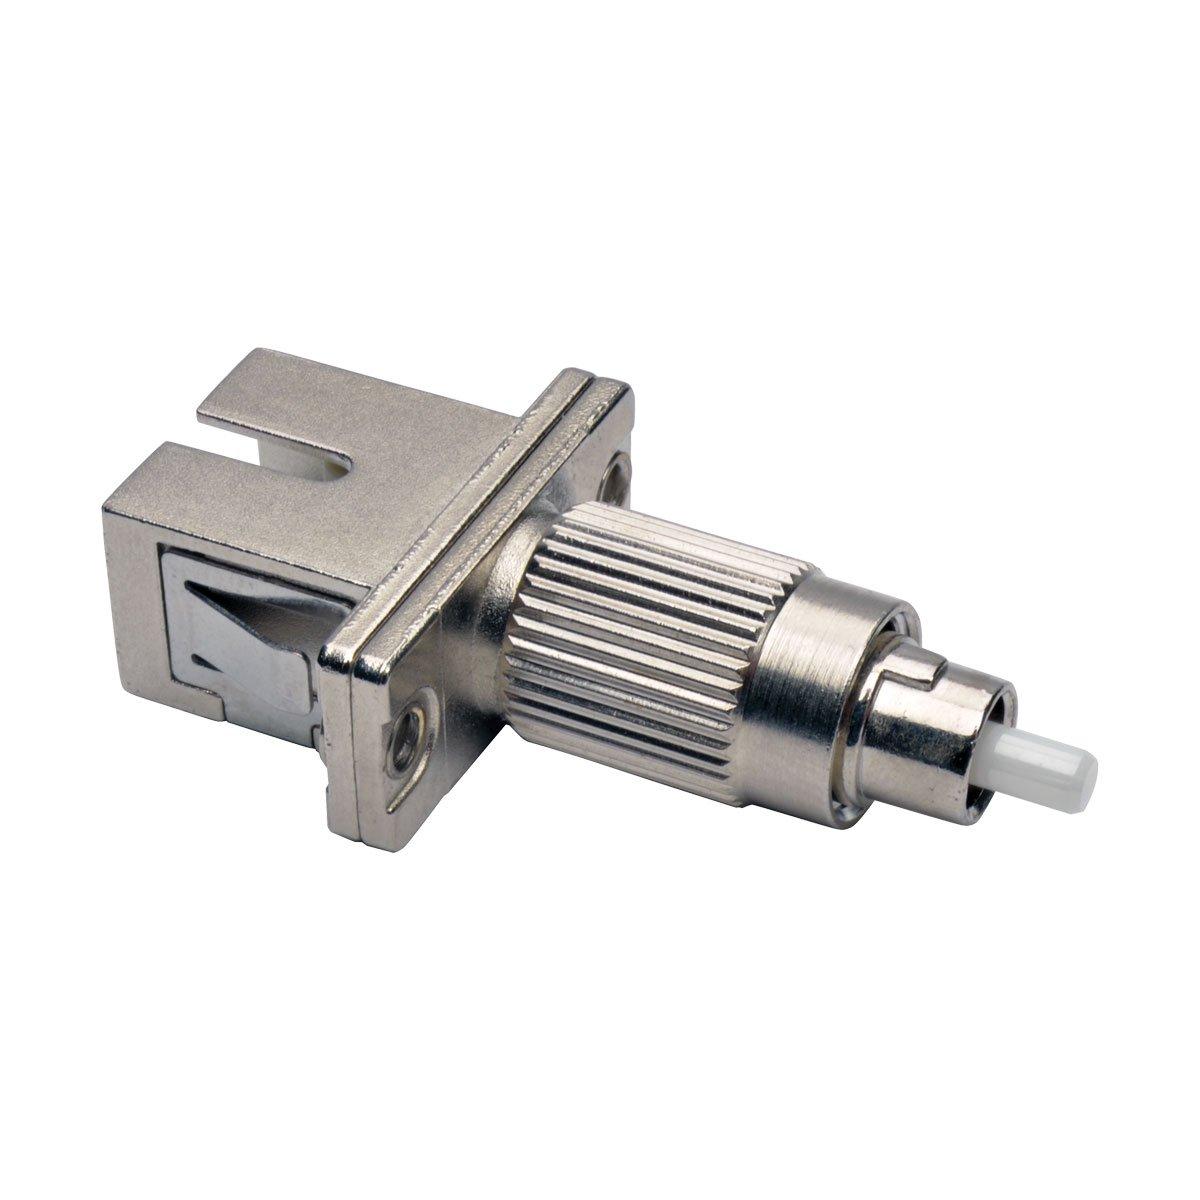 Tripp Lite Optical Fiber Cable Tester Adapter FC/SC 62.5/125 M/F (T020-001-SC62)